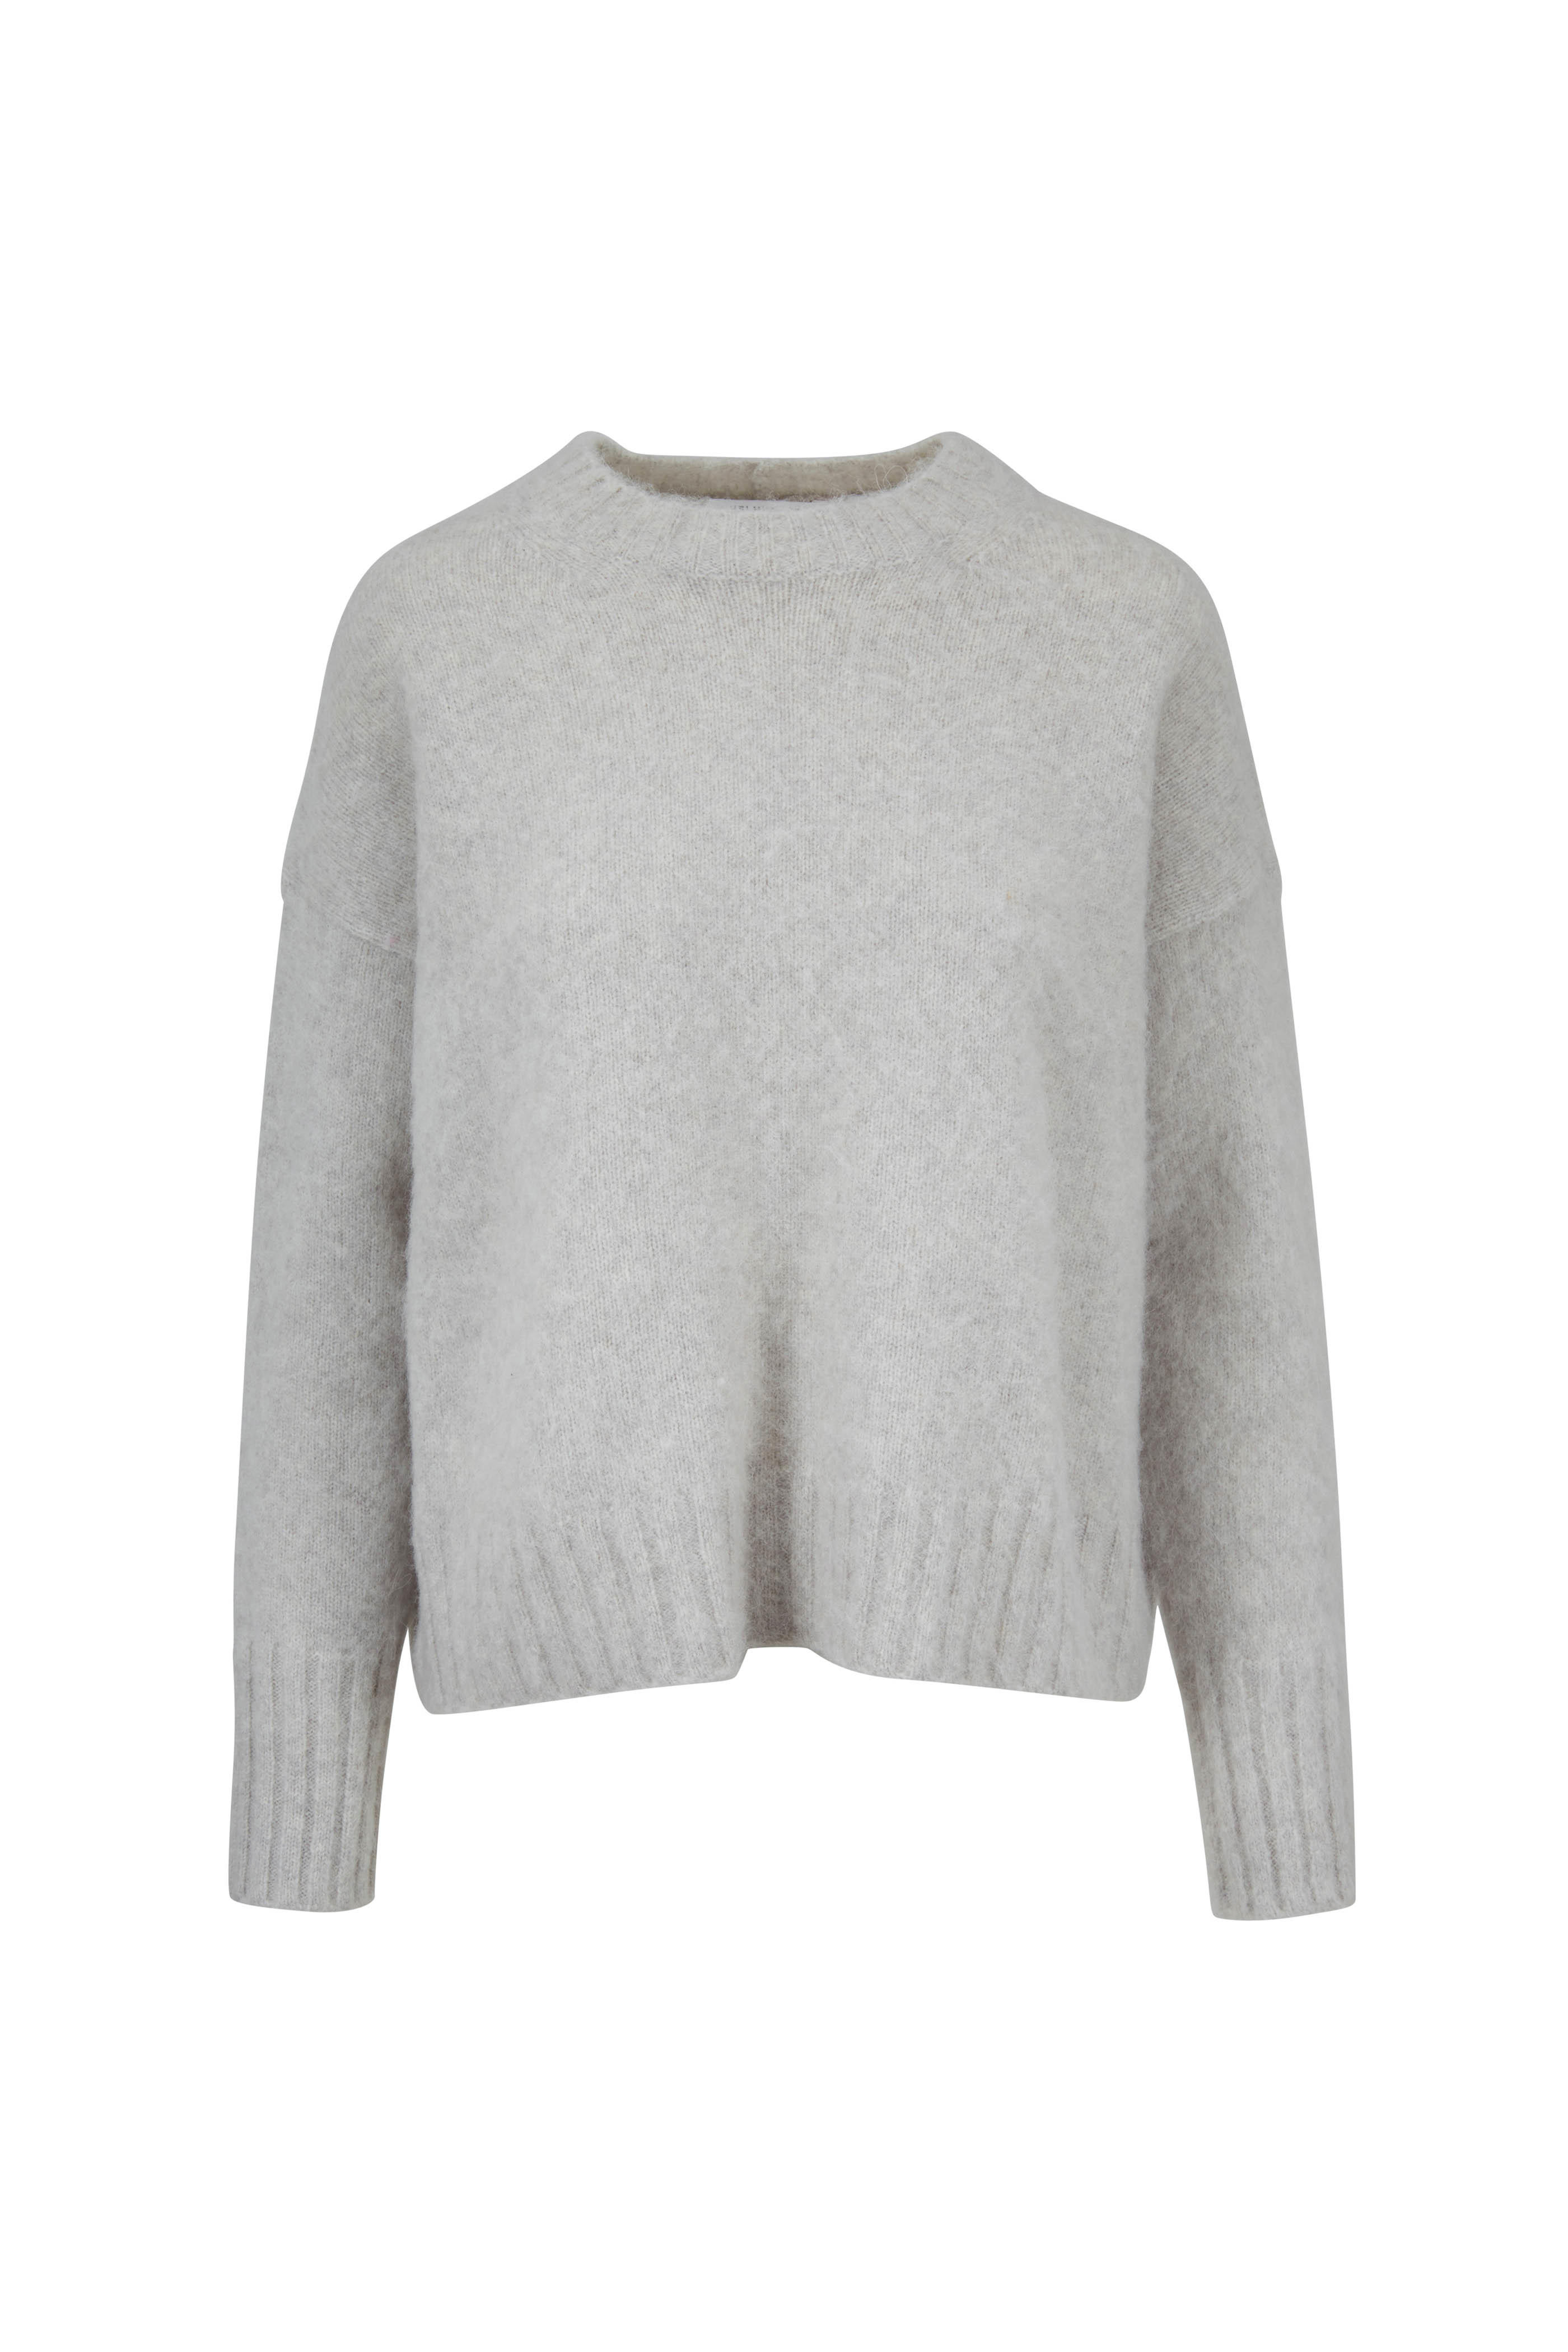 91ffa20122 Helmut Lang - Ghost Gray Brushed Wool Crewneck Sweater